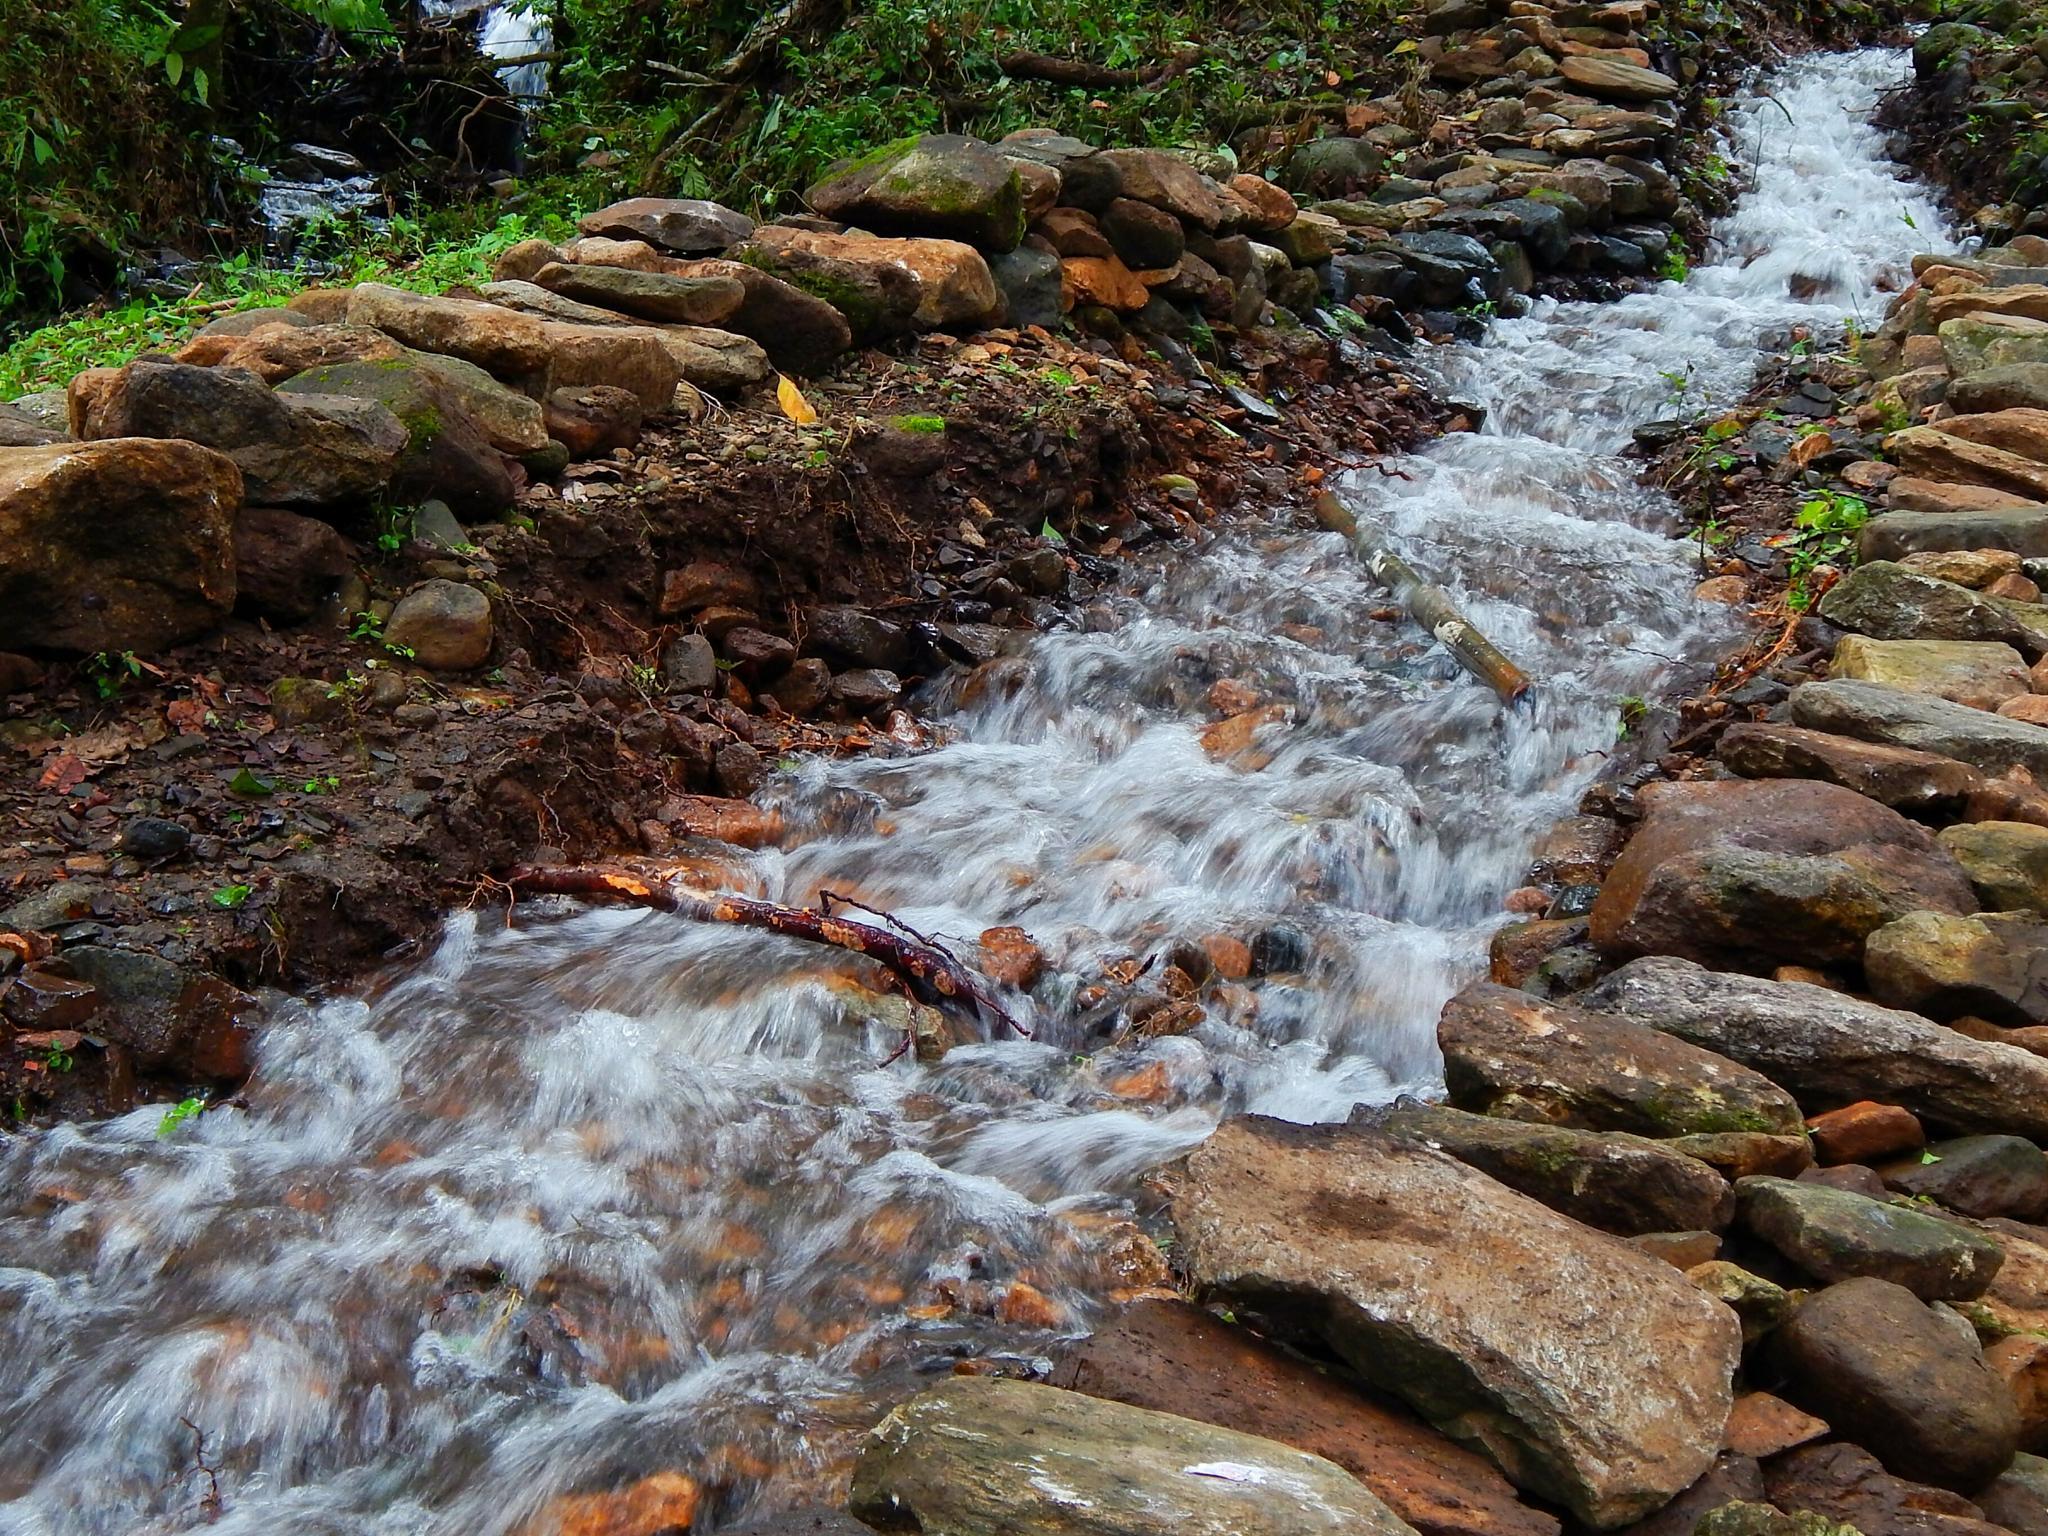 Stream by Aritra ghosh